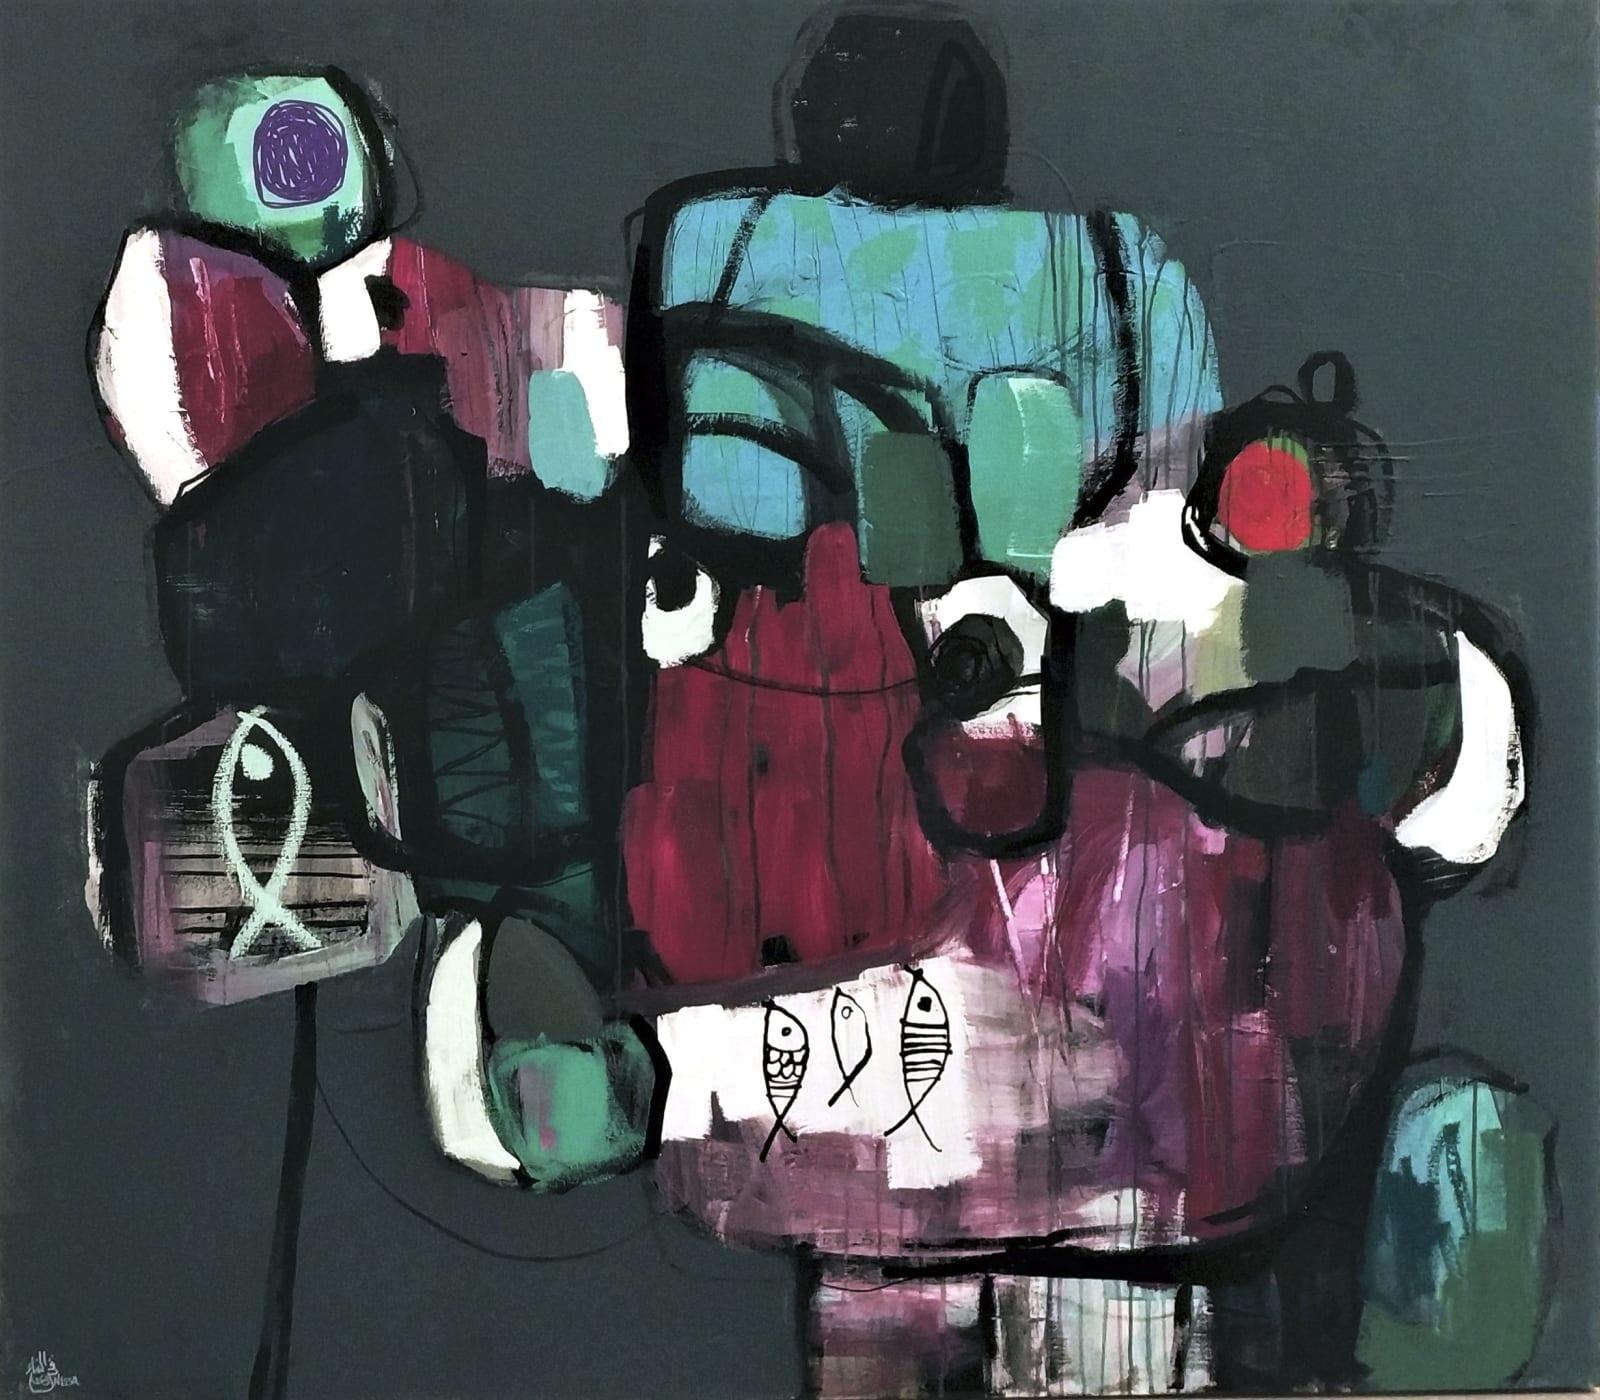 Nissa Raad, Kingdom of You I, 2020, Mixed media on canvas, 140x160cm